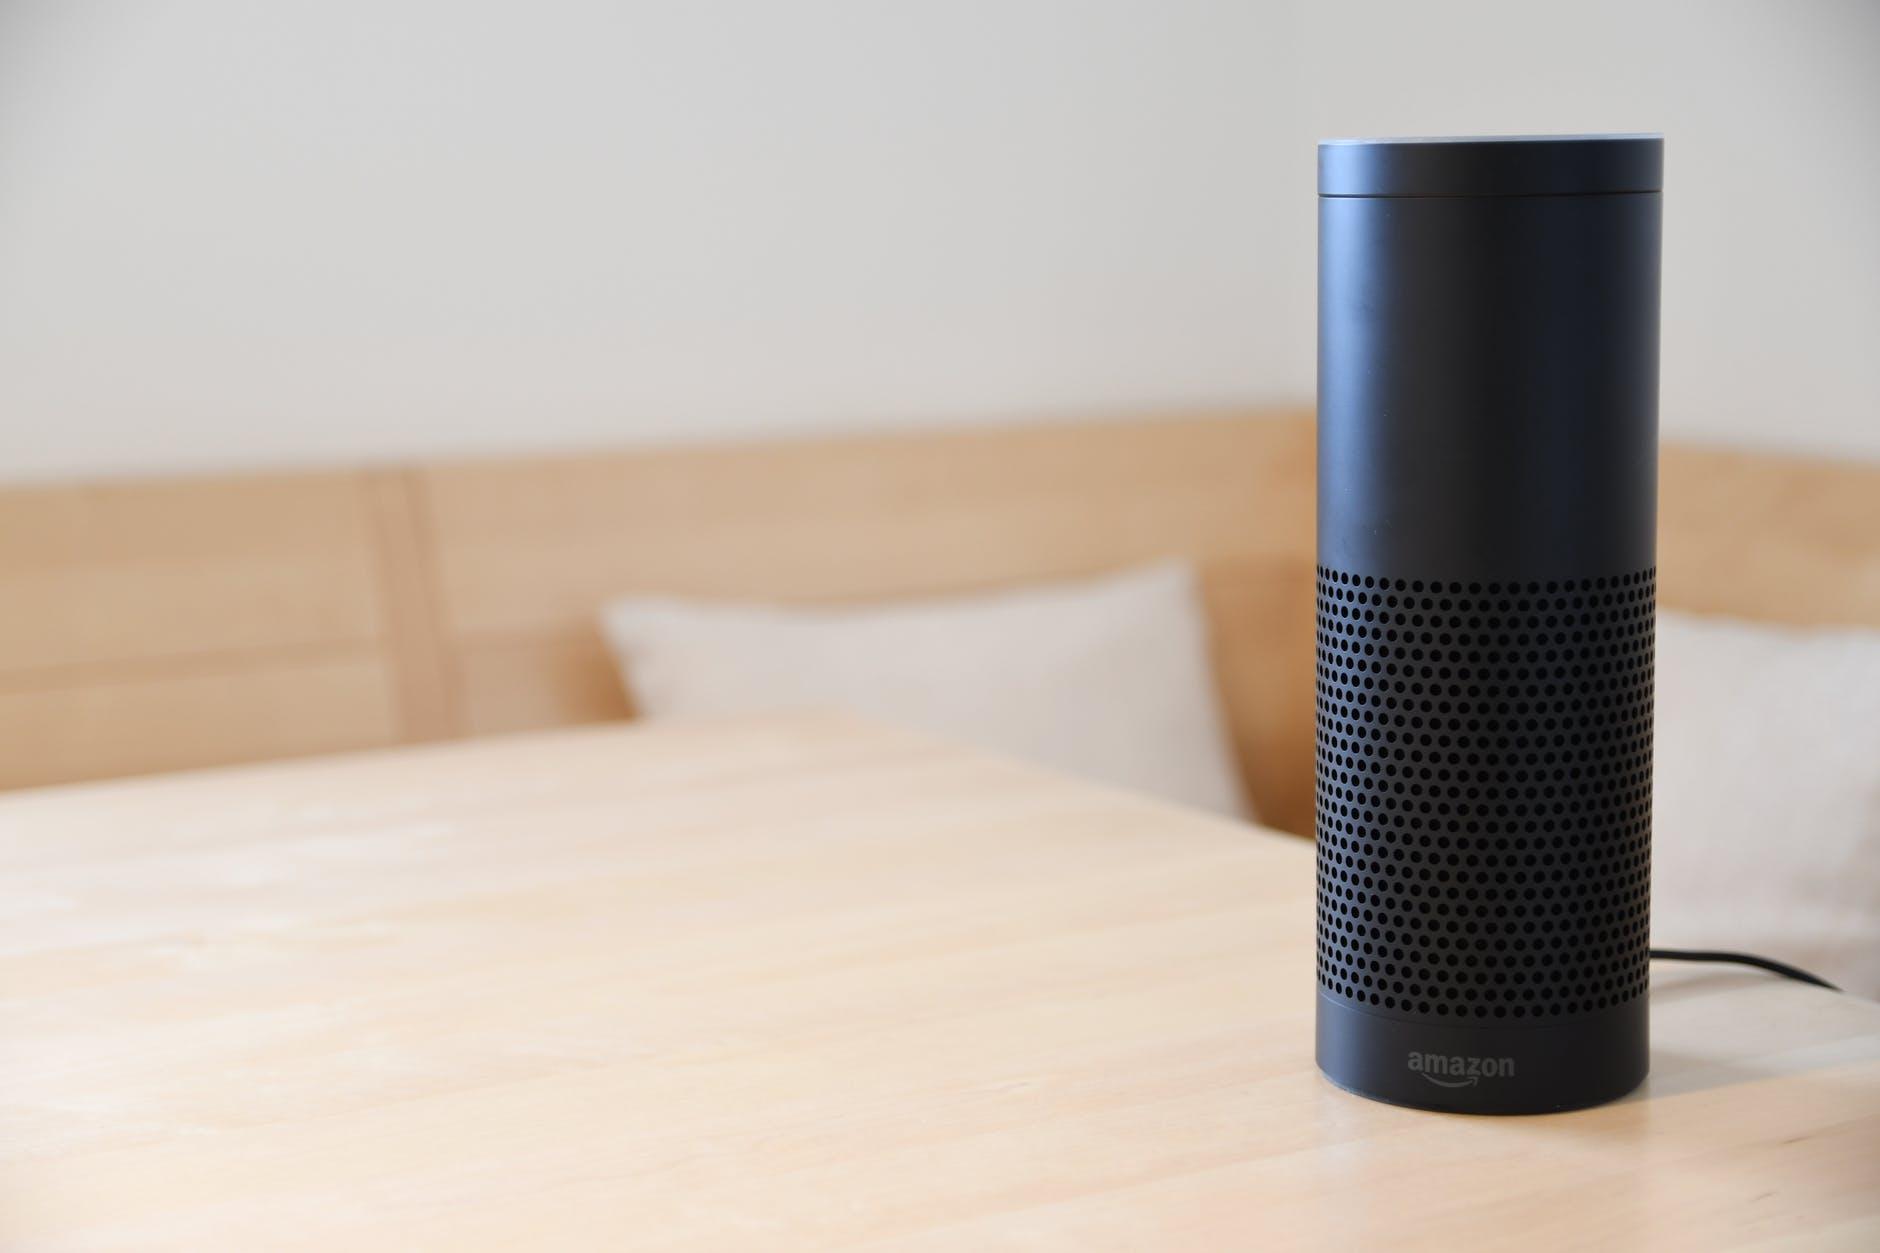 Amazon Alexa parla italiano con i suoi smart speakers